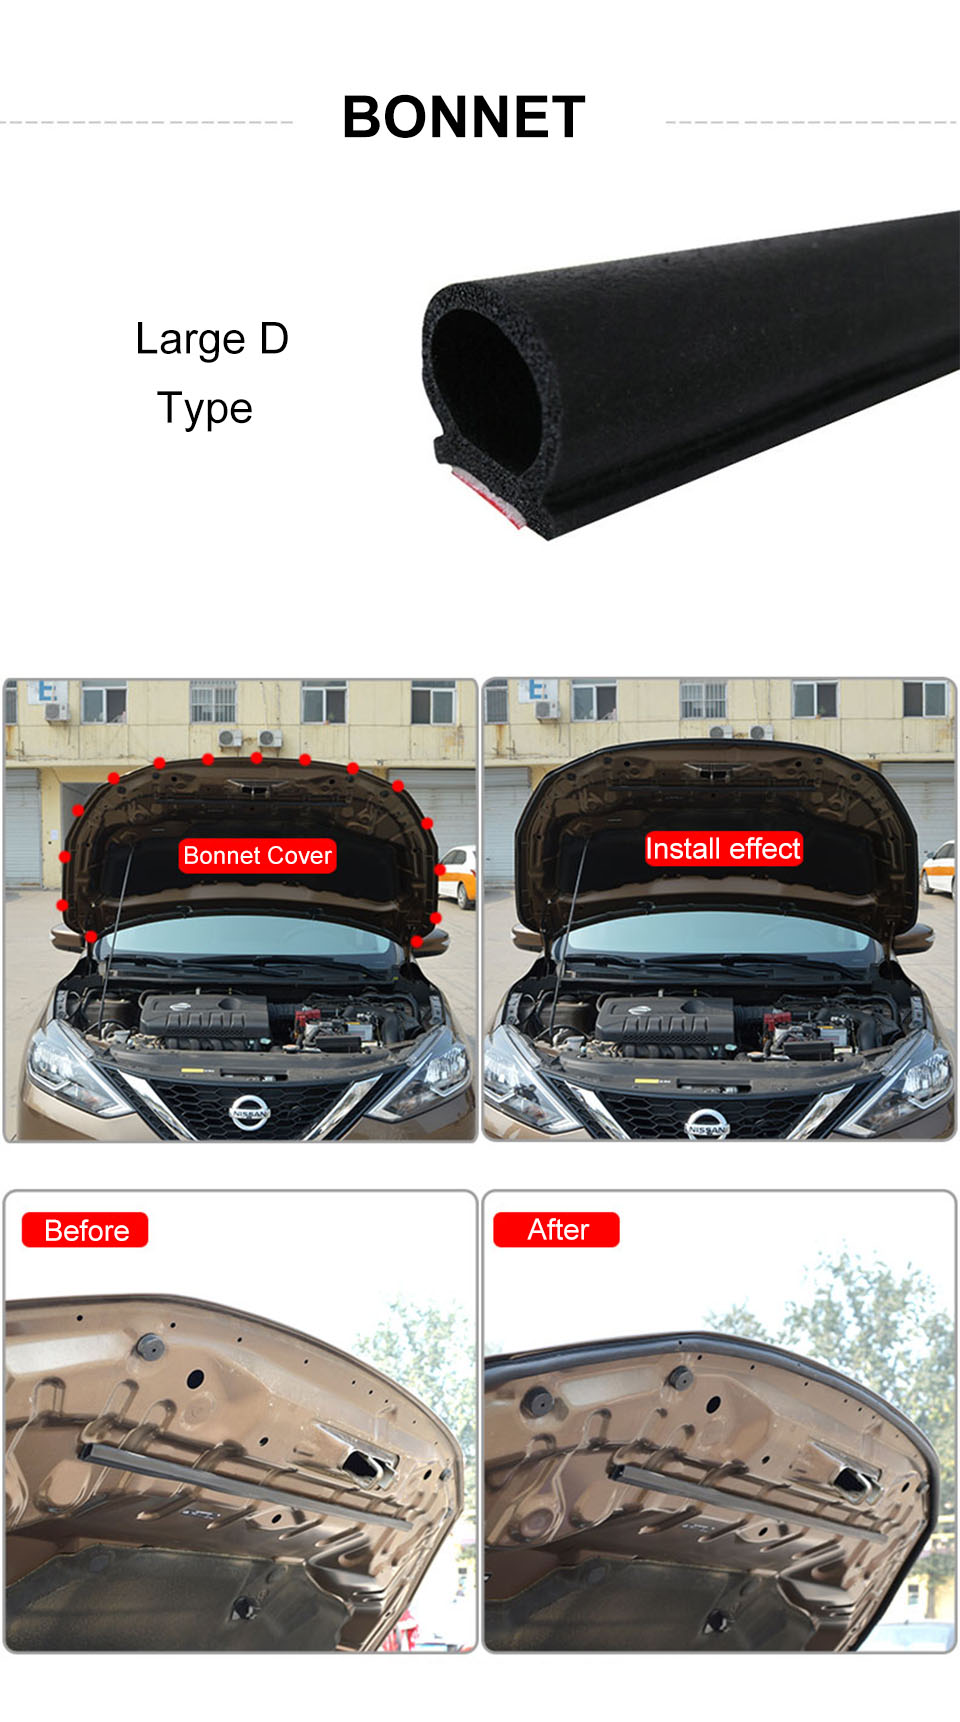 For Peugeot 206 307 Car Front Rear Doors Bonnet Trunk Cover Anti Fuse Box Buzzing Tb2gmwxx9ijebjsspixxbqafxa 1713255435